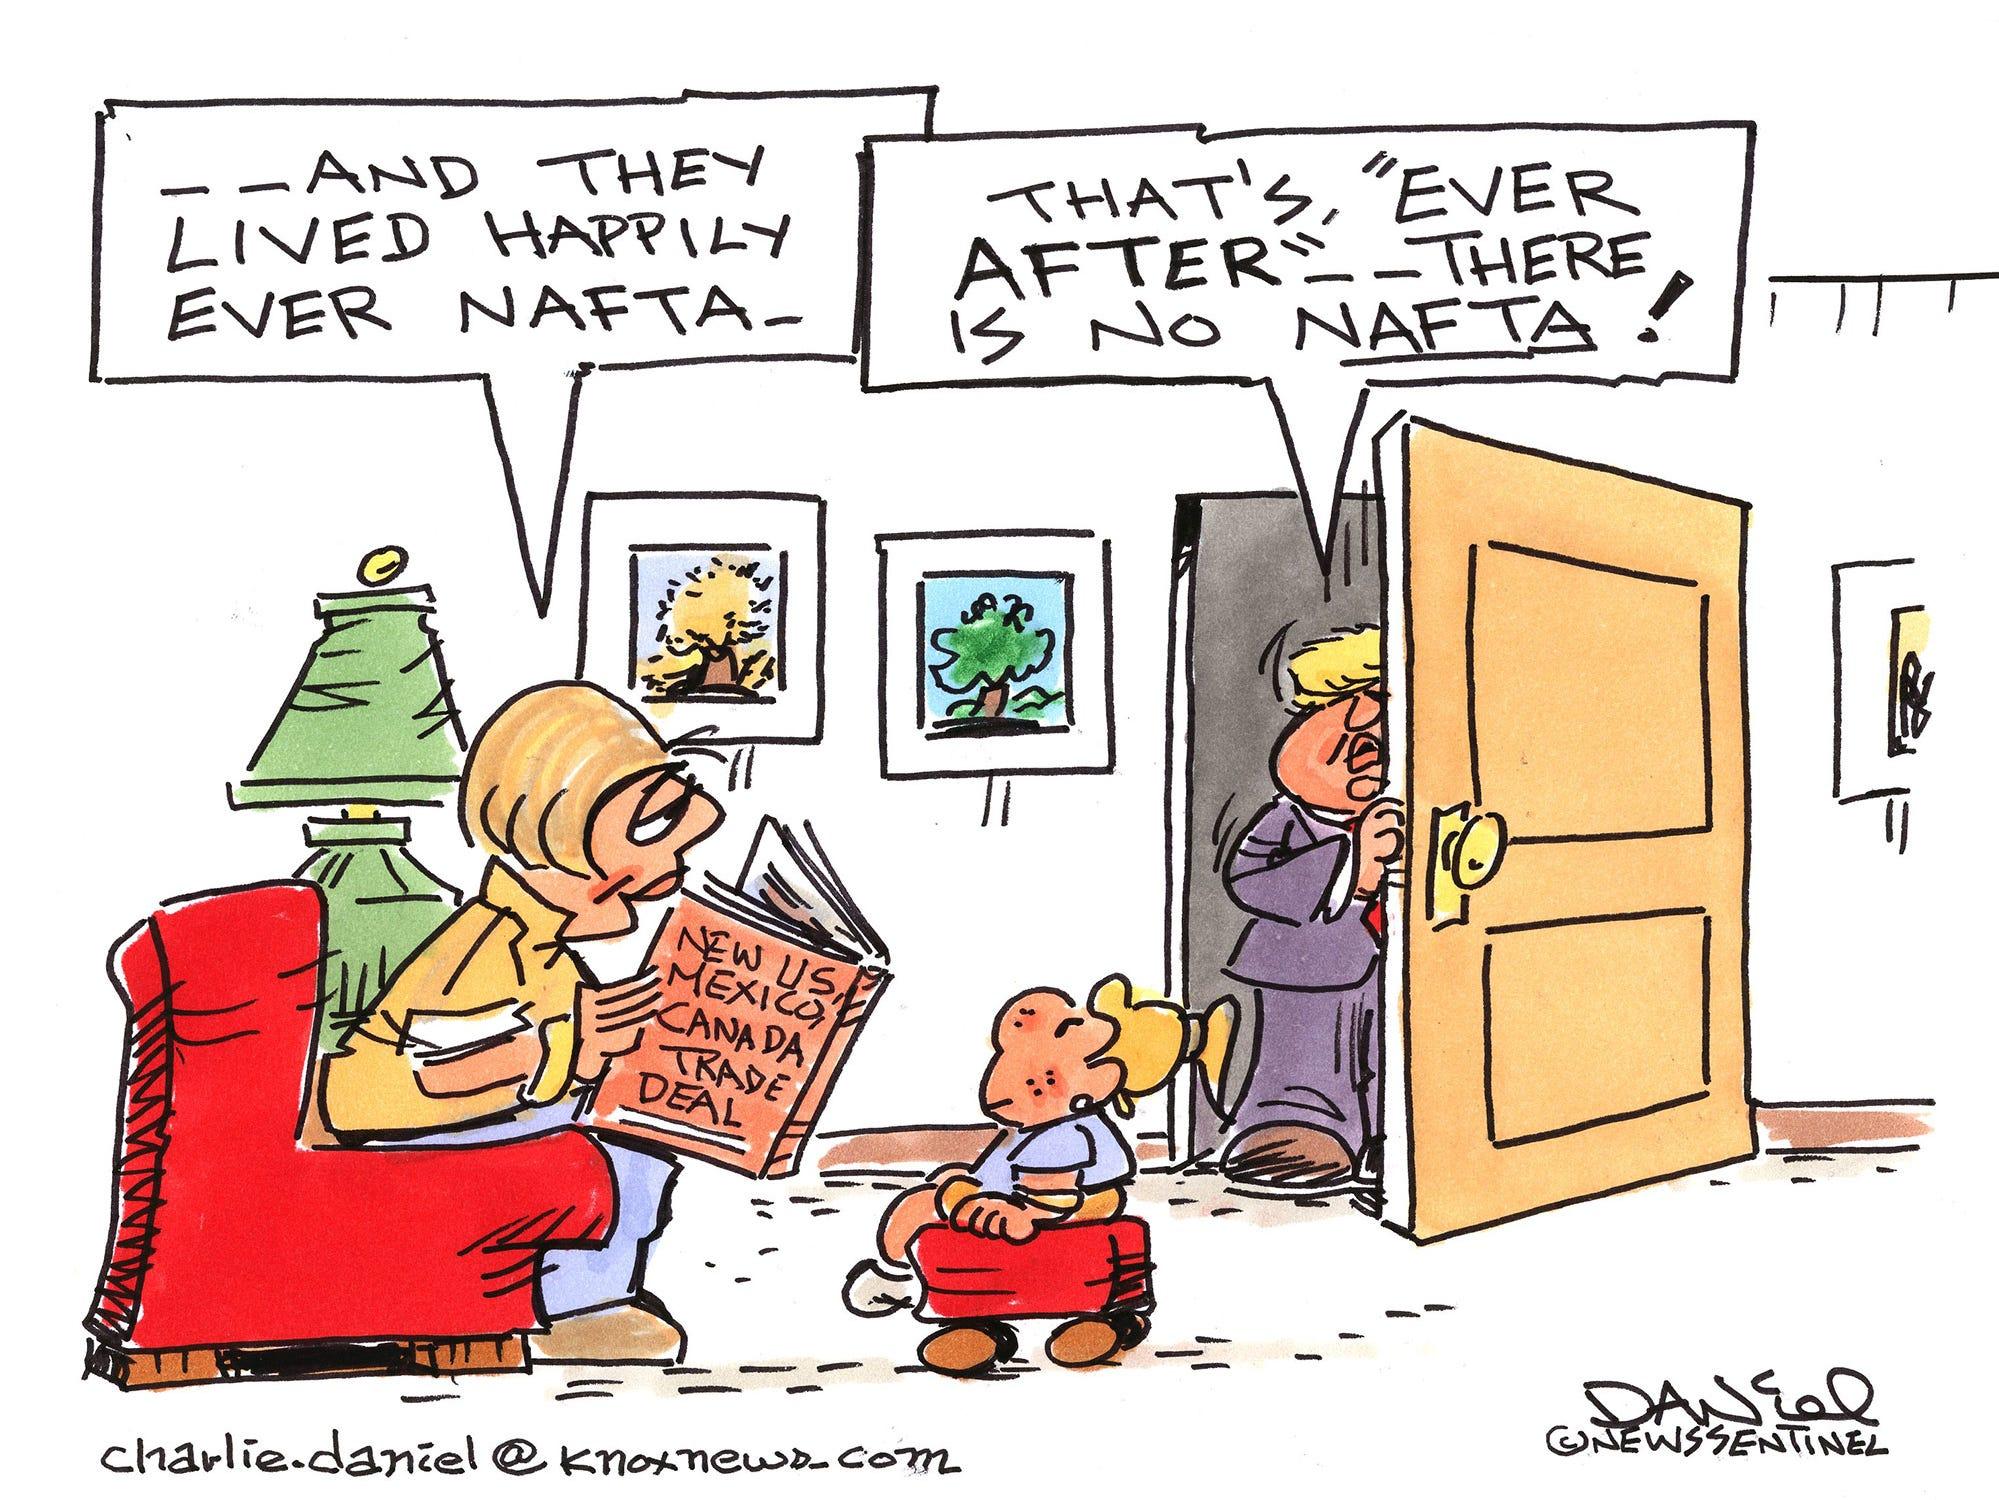 Charlie Daniel cartoon for Thursday, Oct. 4, 2018